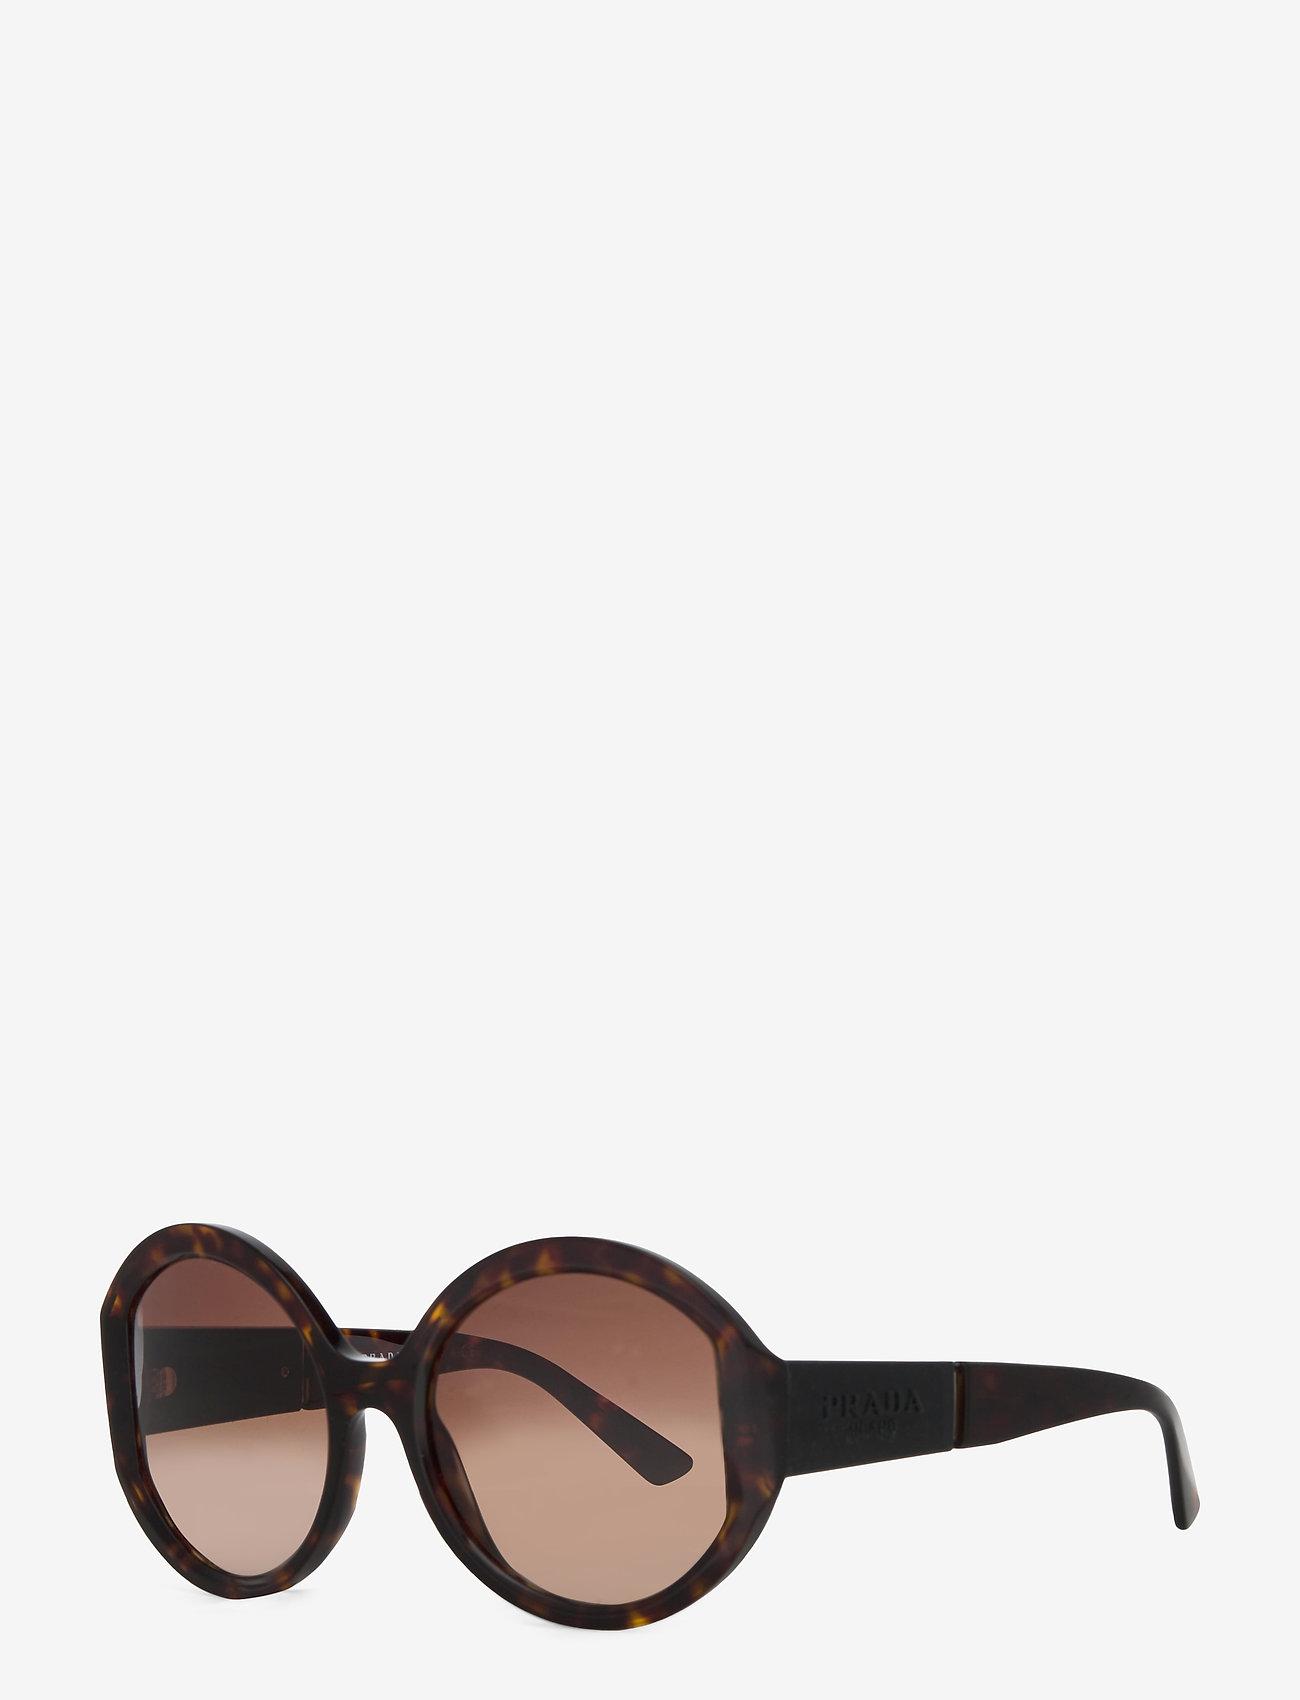 Prada Sunglasses - Sunglasses - rond model - brown gradient - 1